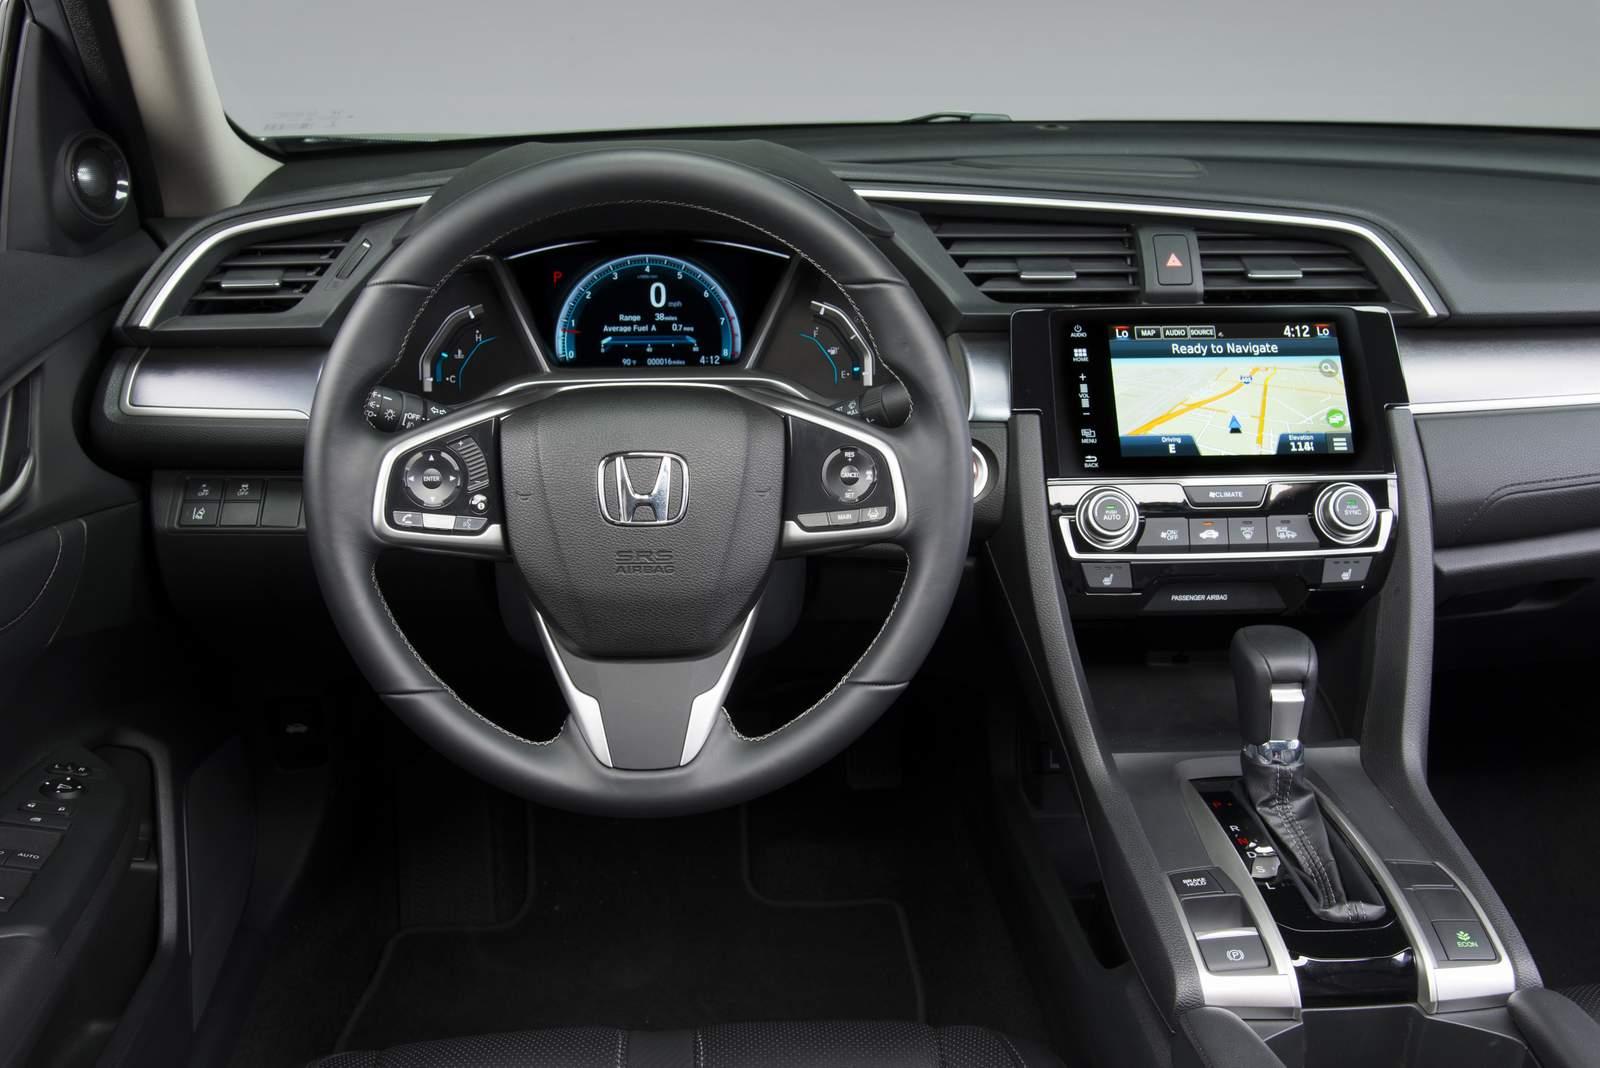 Novo Honda Civic 2017 - interior - painel